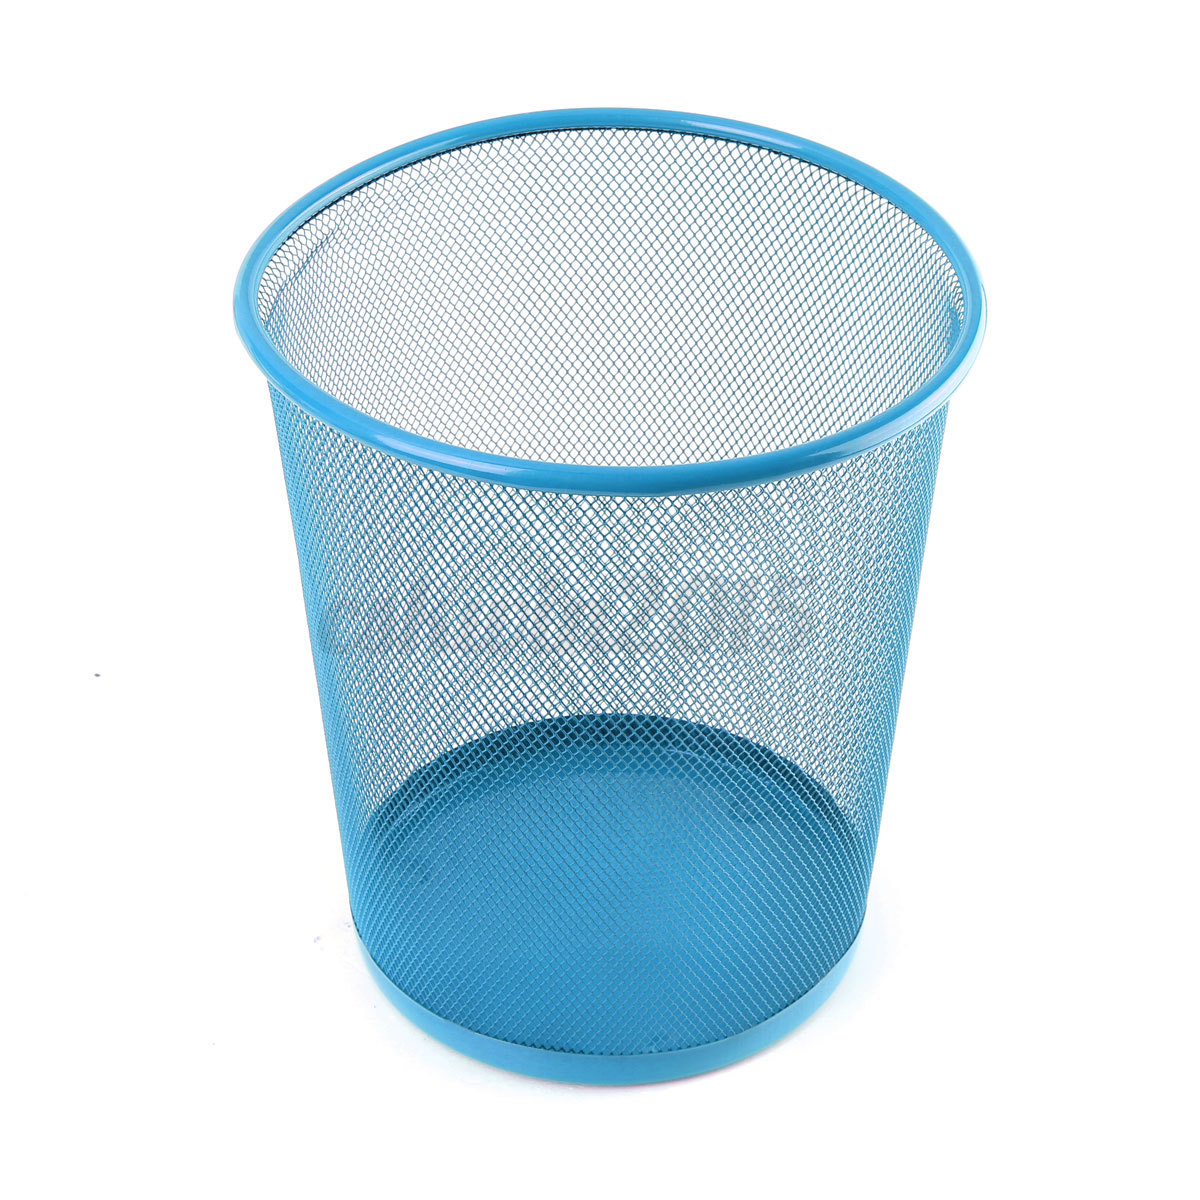 Mesh Waste Paper Net Bin Iron Metal Wire Rubbish Trash Basket for ...